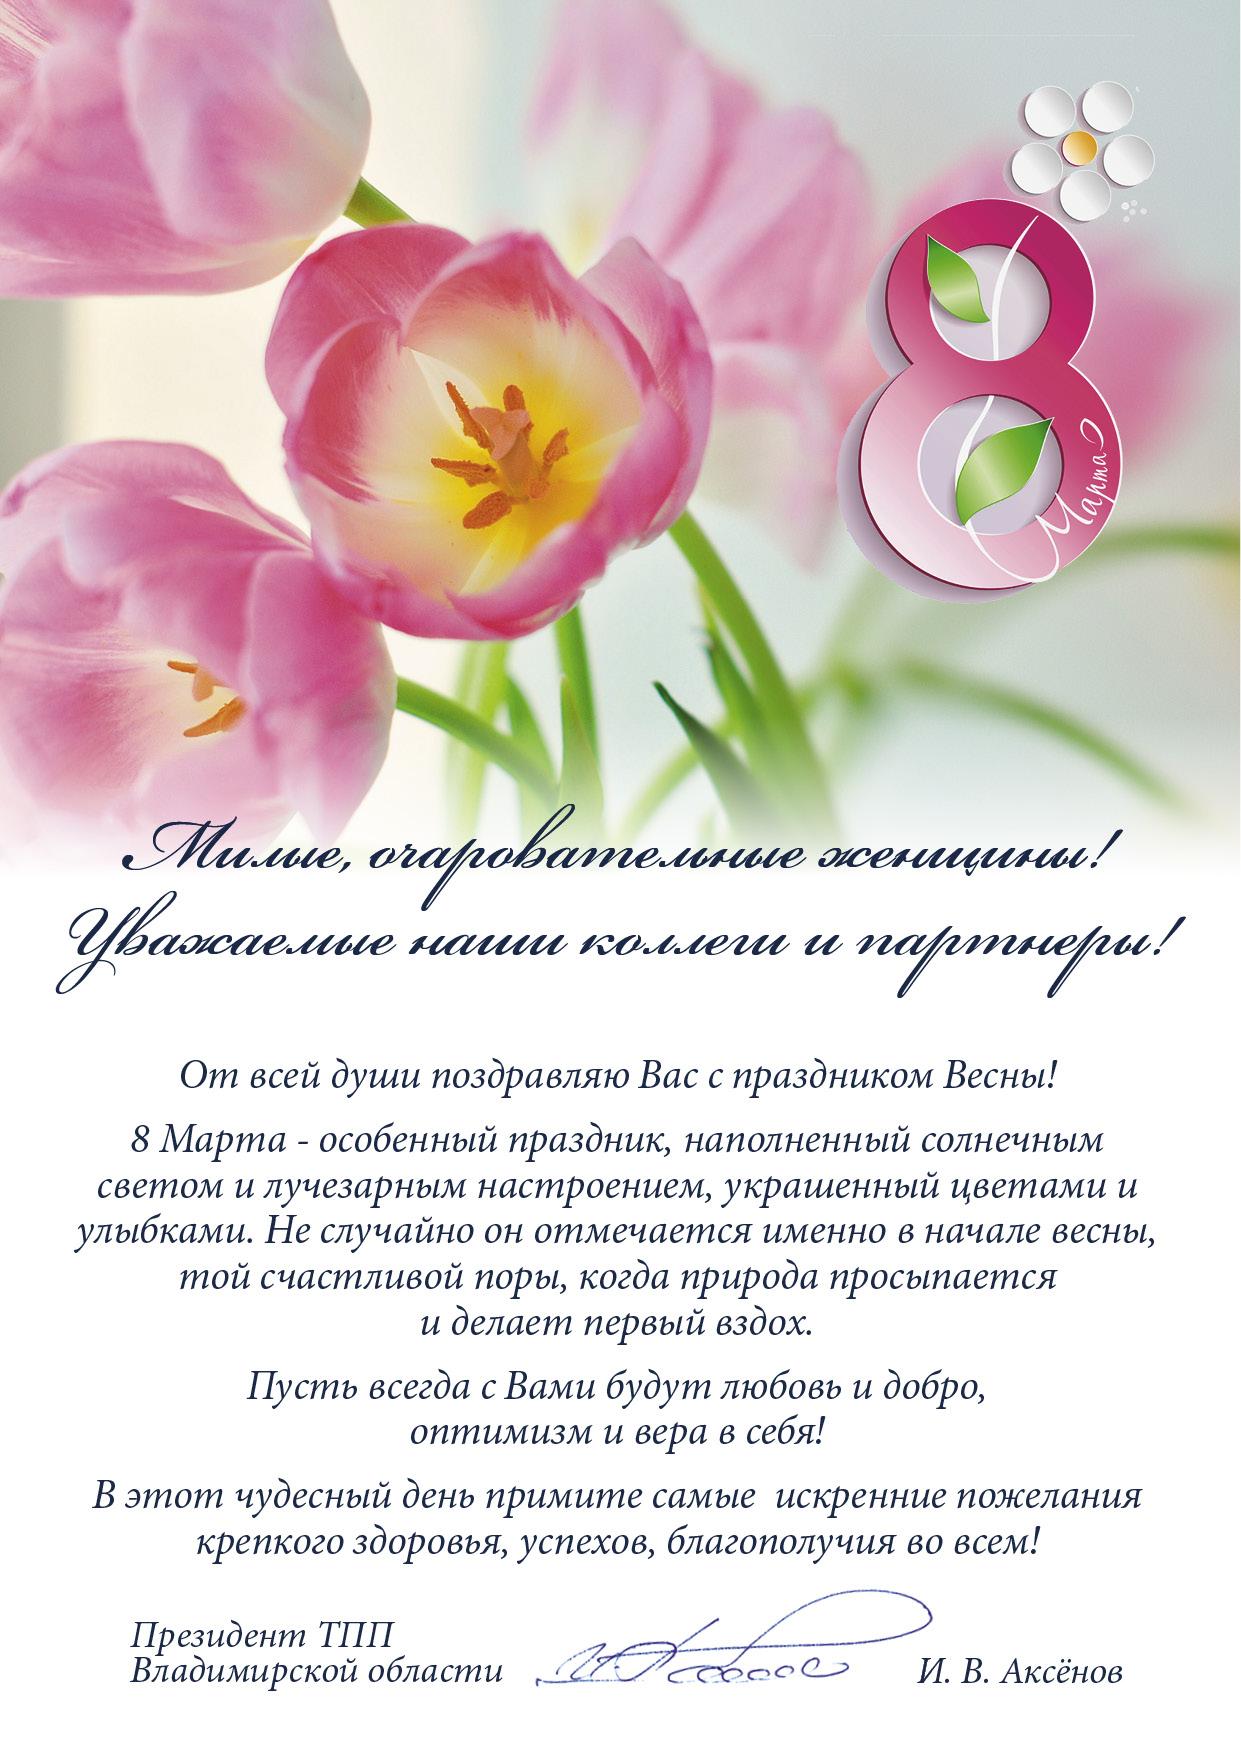 Поздравление с 8 марта от области